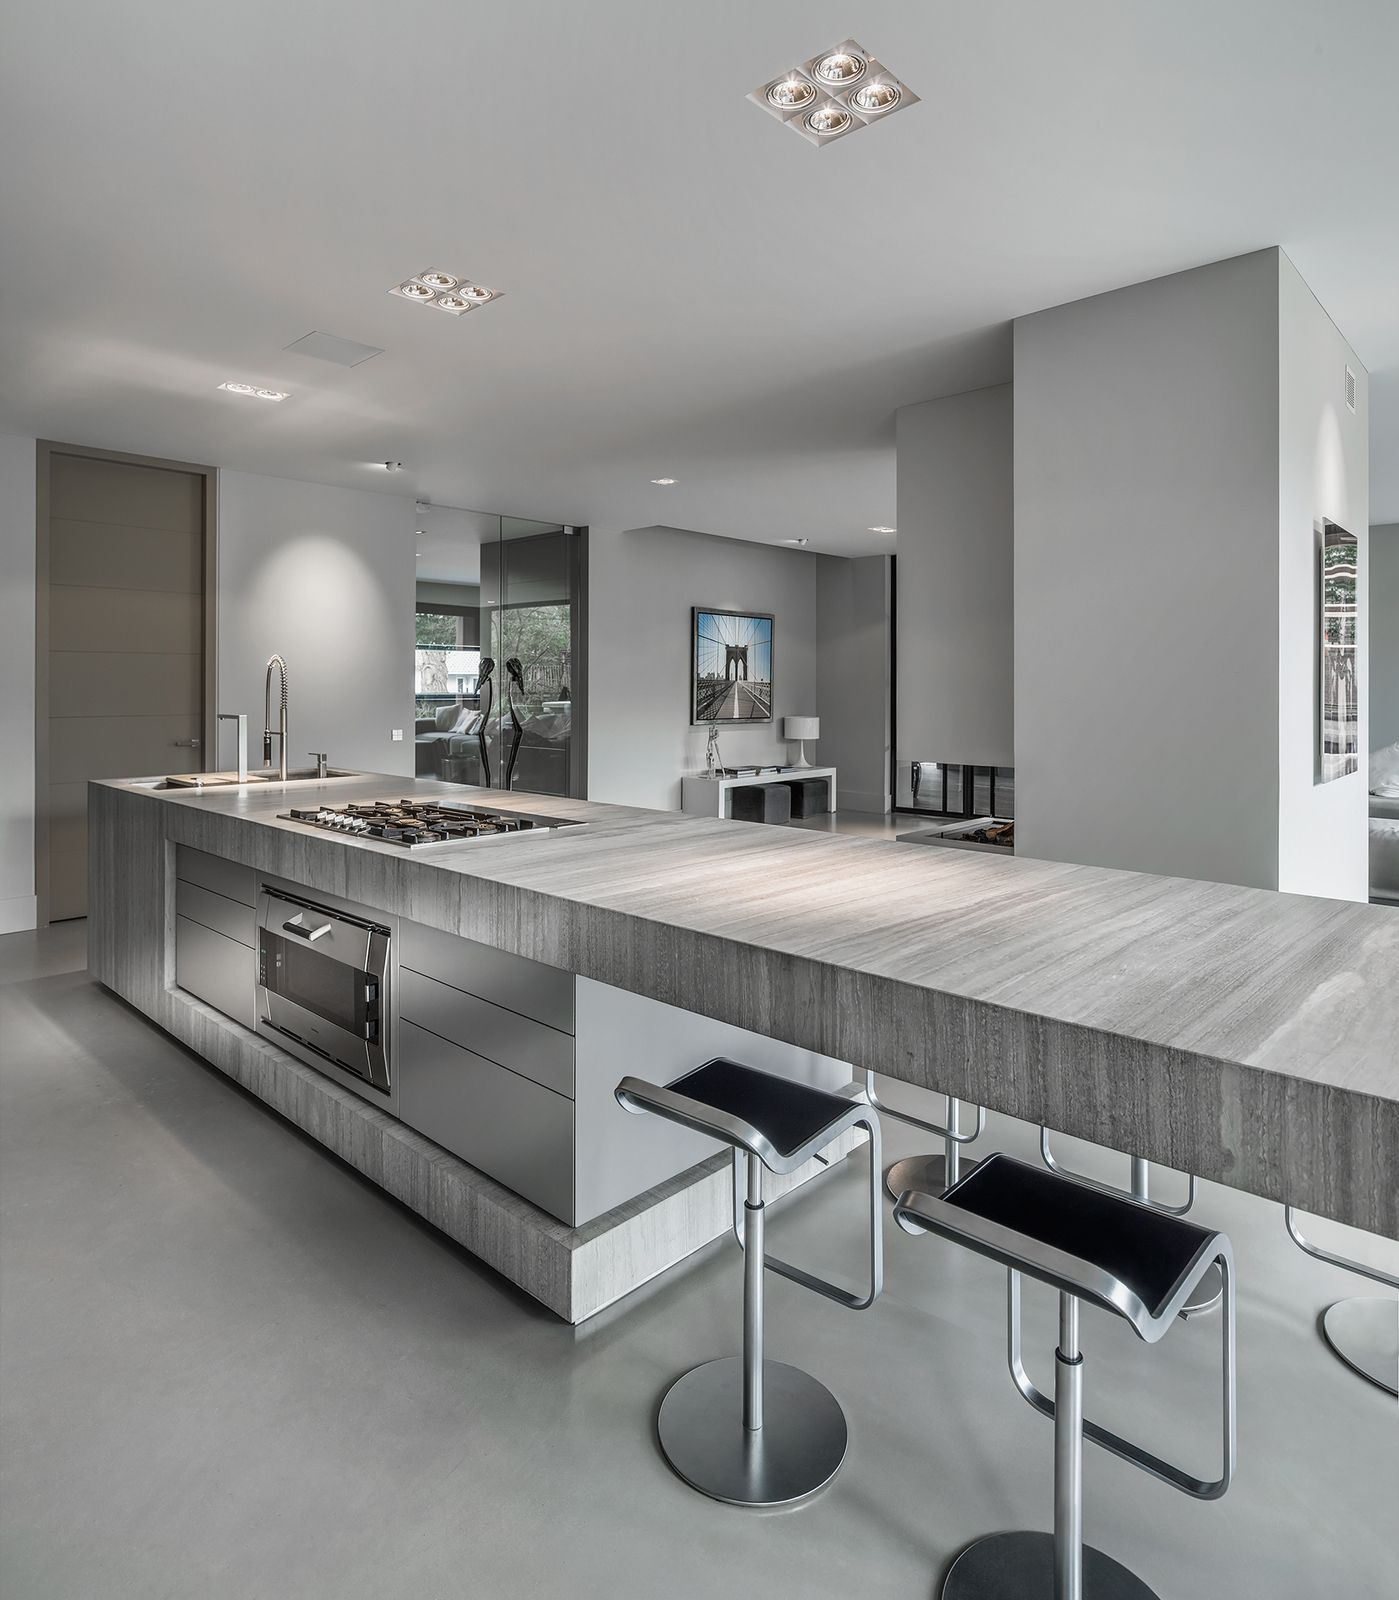 High End Kitchens Interiors Italiaanse Keukens En Maatkeukens